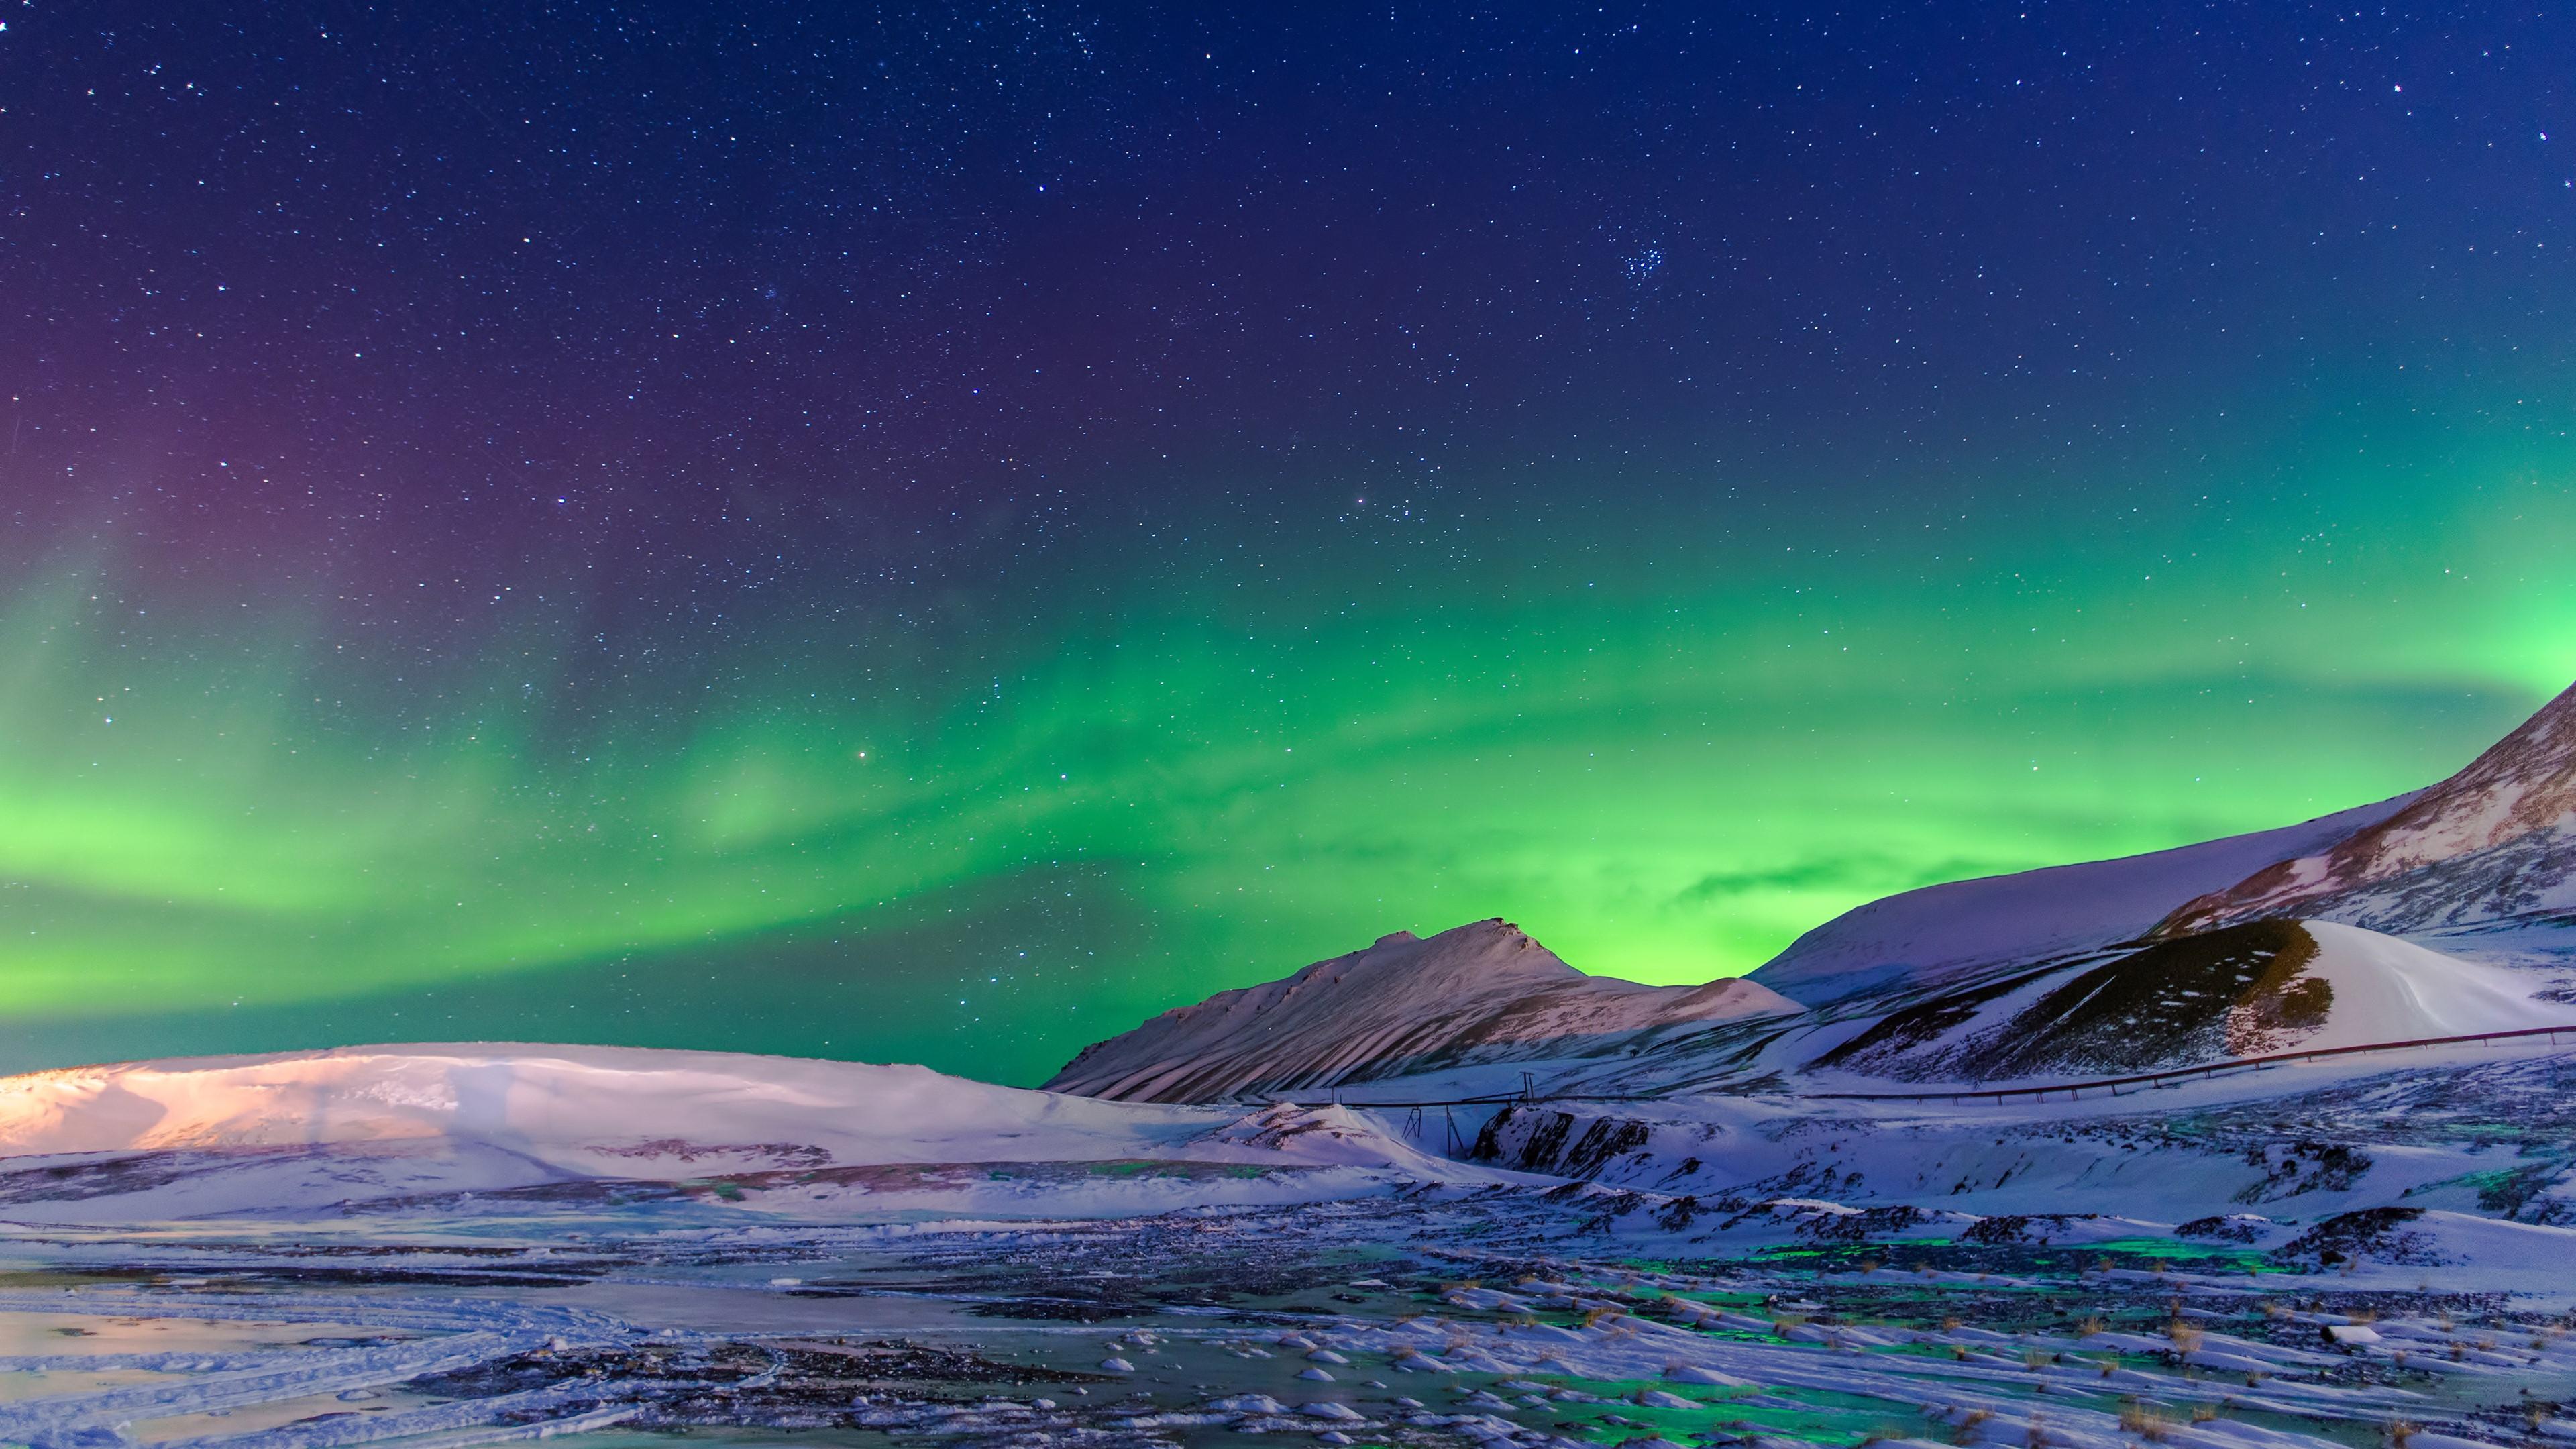 Aurora Borealis 4k Hd Nature 4k Wallpapers Images Backgrounds